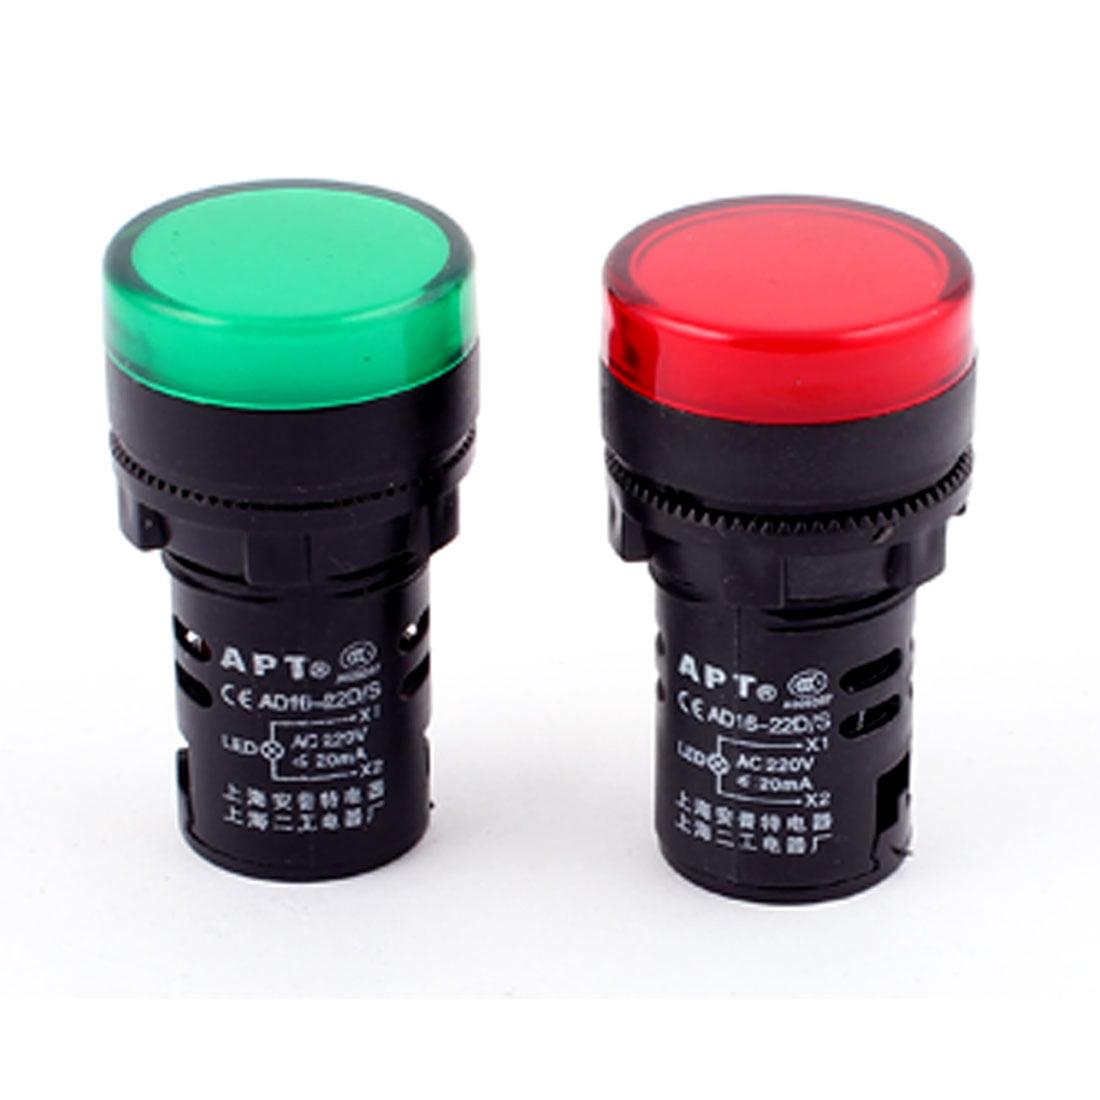 2 Pcs Plastic LED Turn Indicator Signal Neon  Lamp Green Light AC 220V